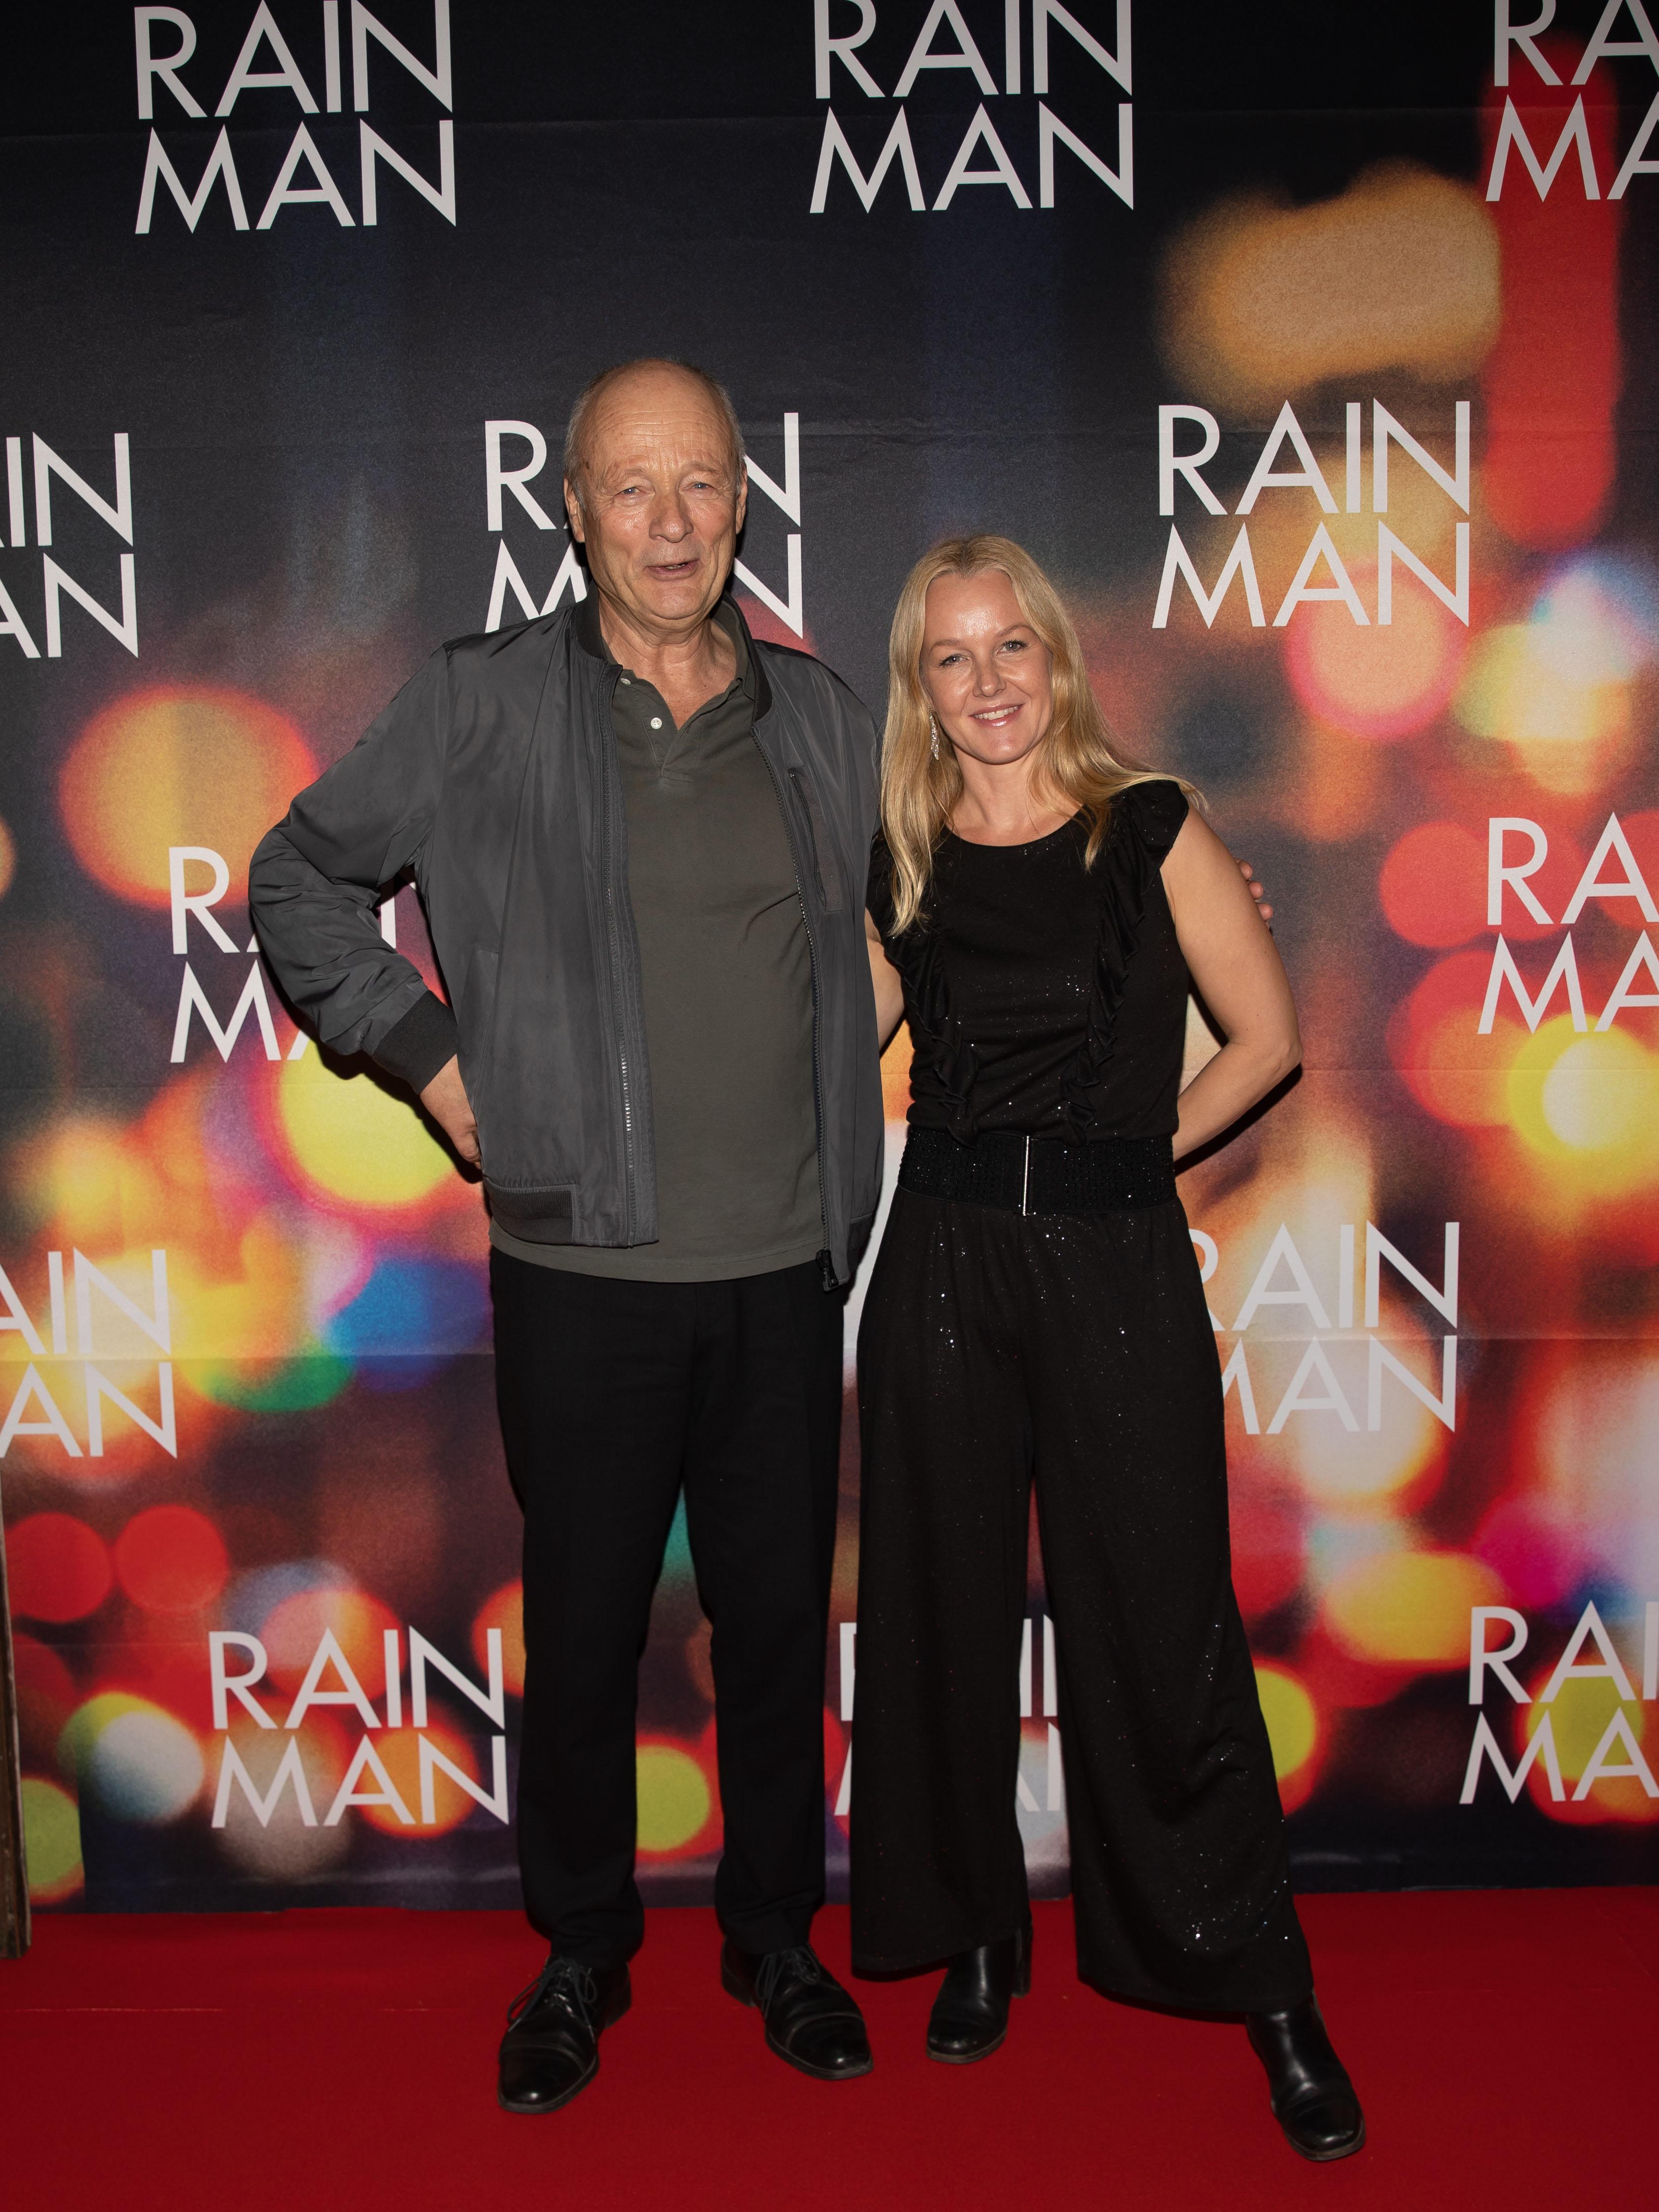 rainman04